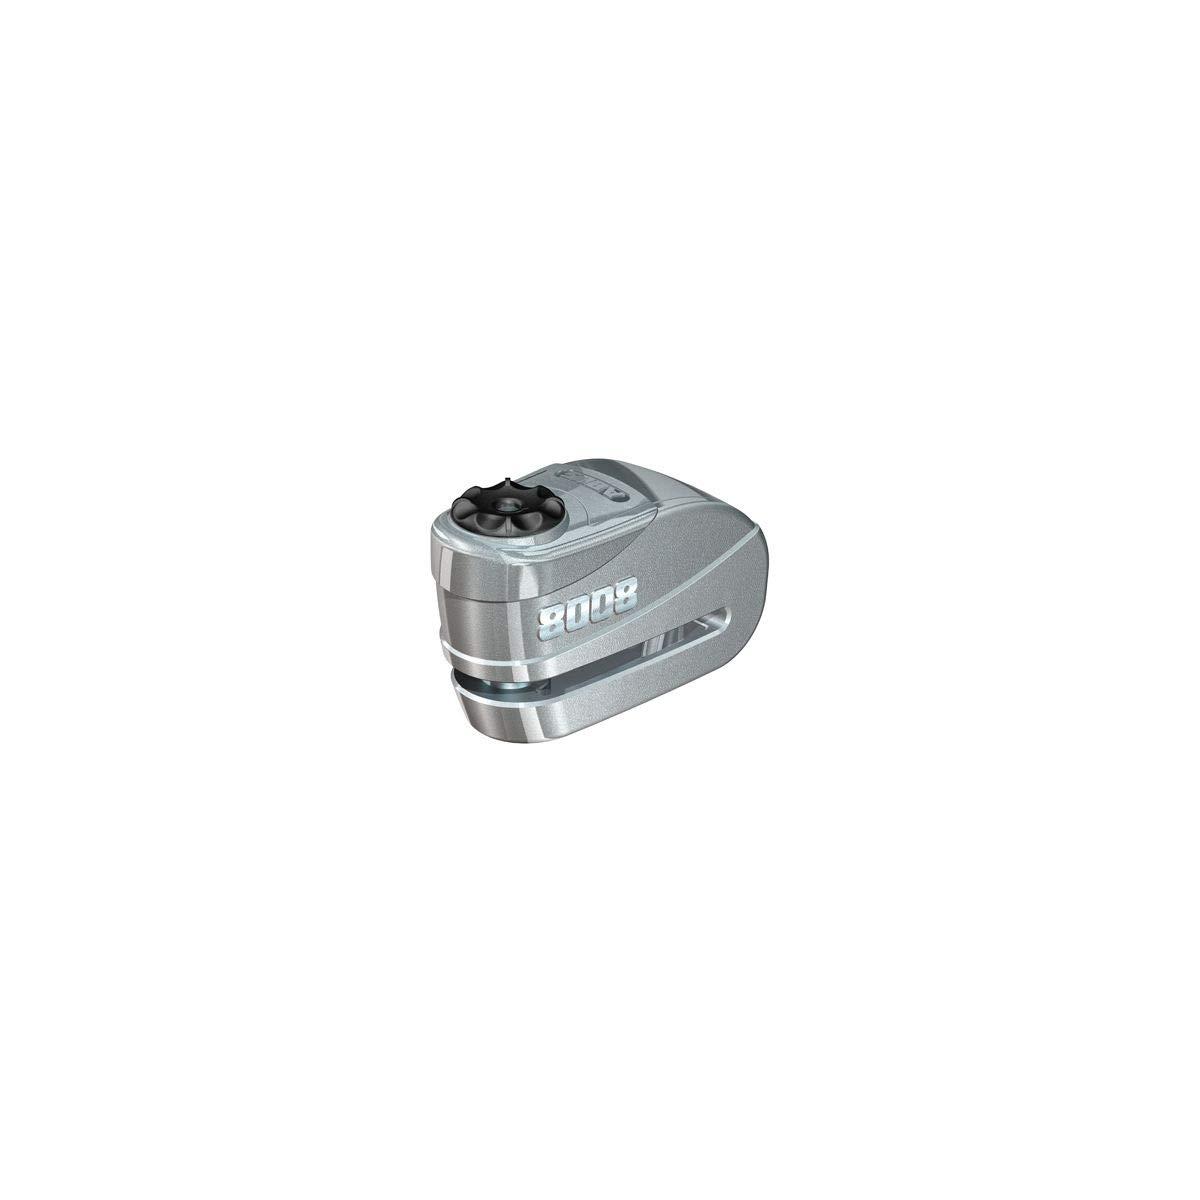 ABUS Granit Detecto X-Plus 8008 Alarm Disc Lock (Silver) by ABUS